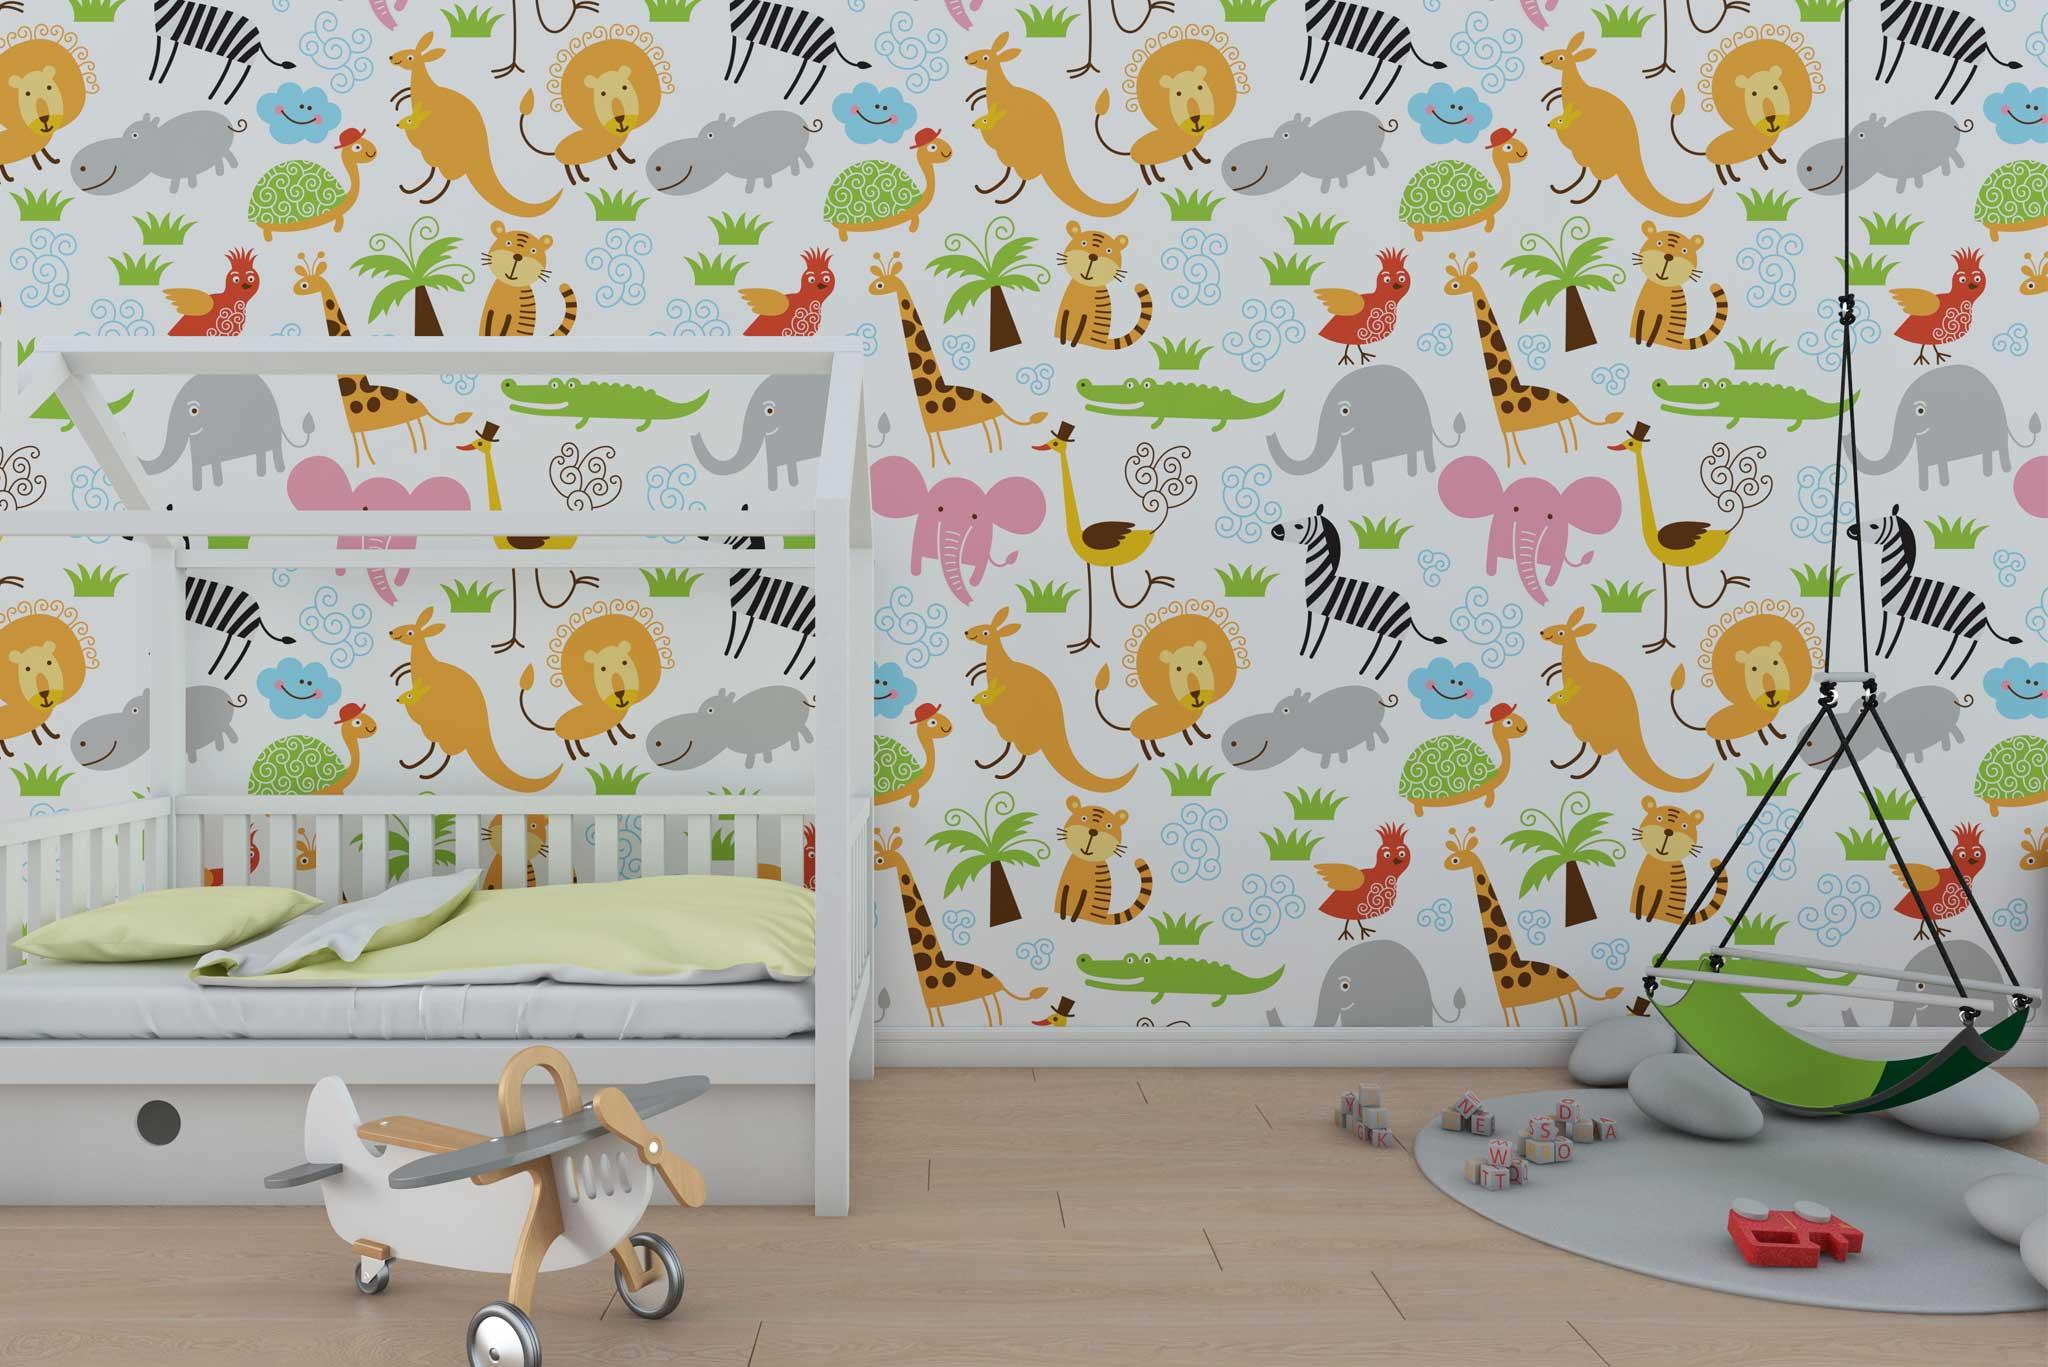 https://daringprints.ro/wp-content/uploads/2020/12/tapet-fototapet-personalizat-comanda-bucuresti-special-copii-camera-dormitor-perete-animale-jungla-safari-vesel-desene.jpg